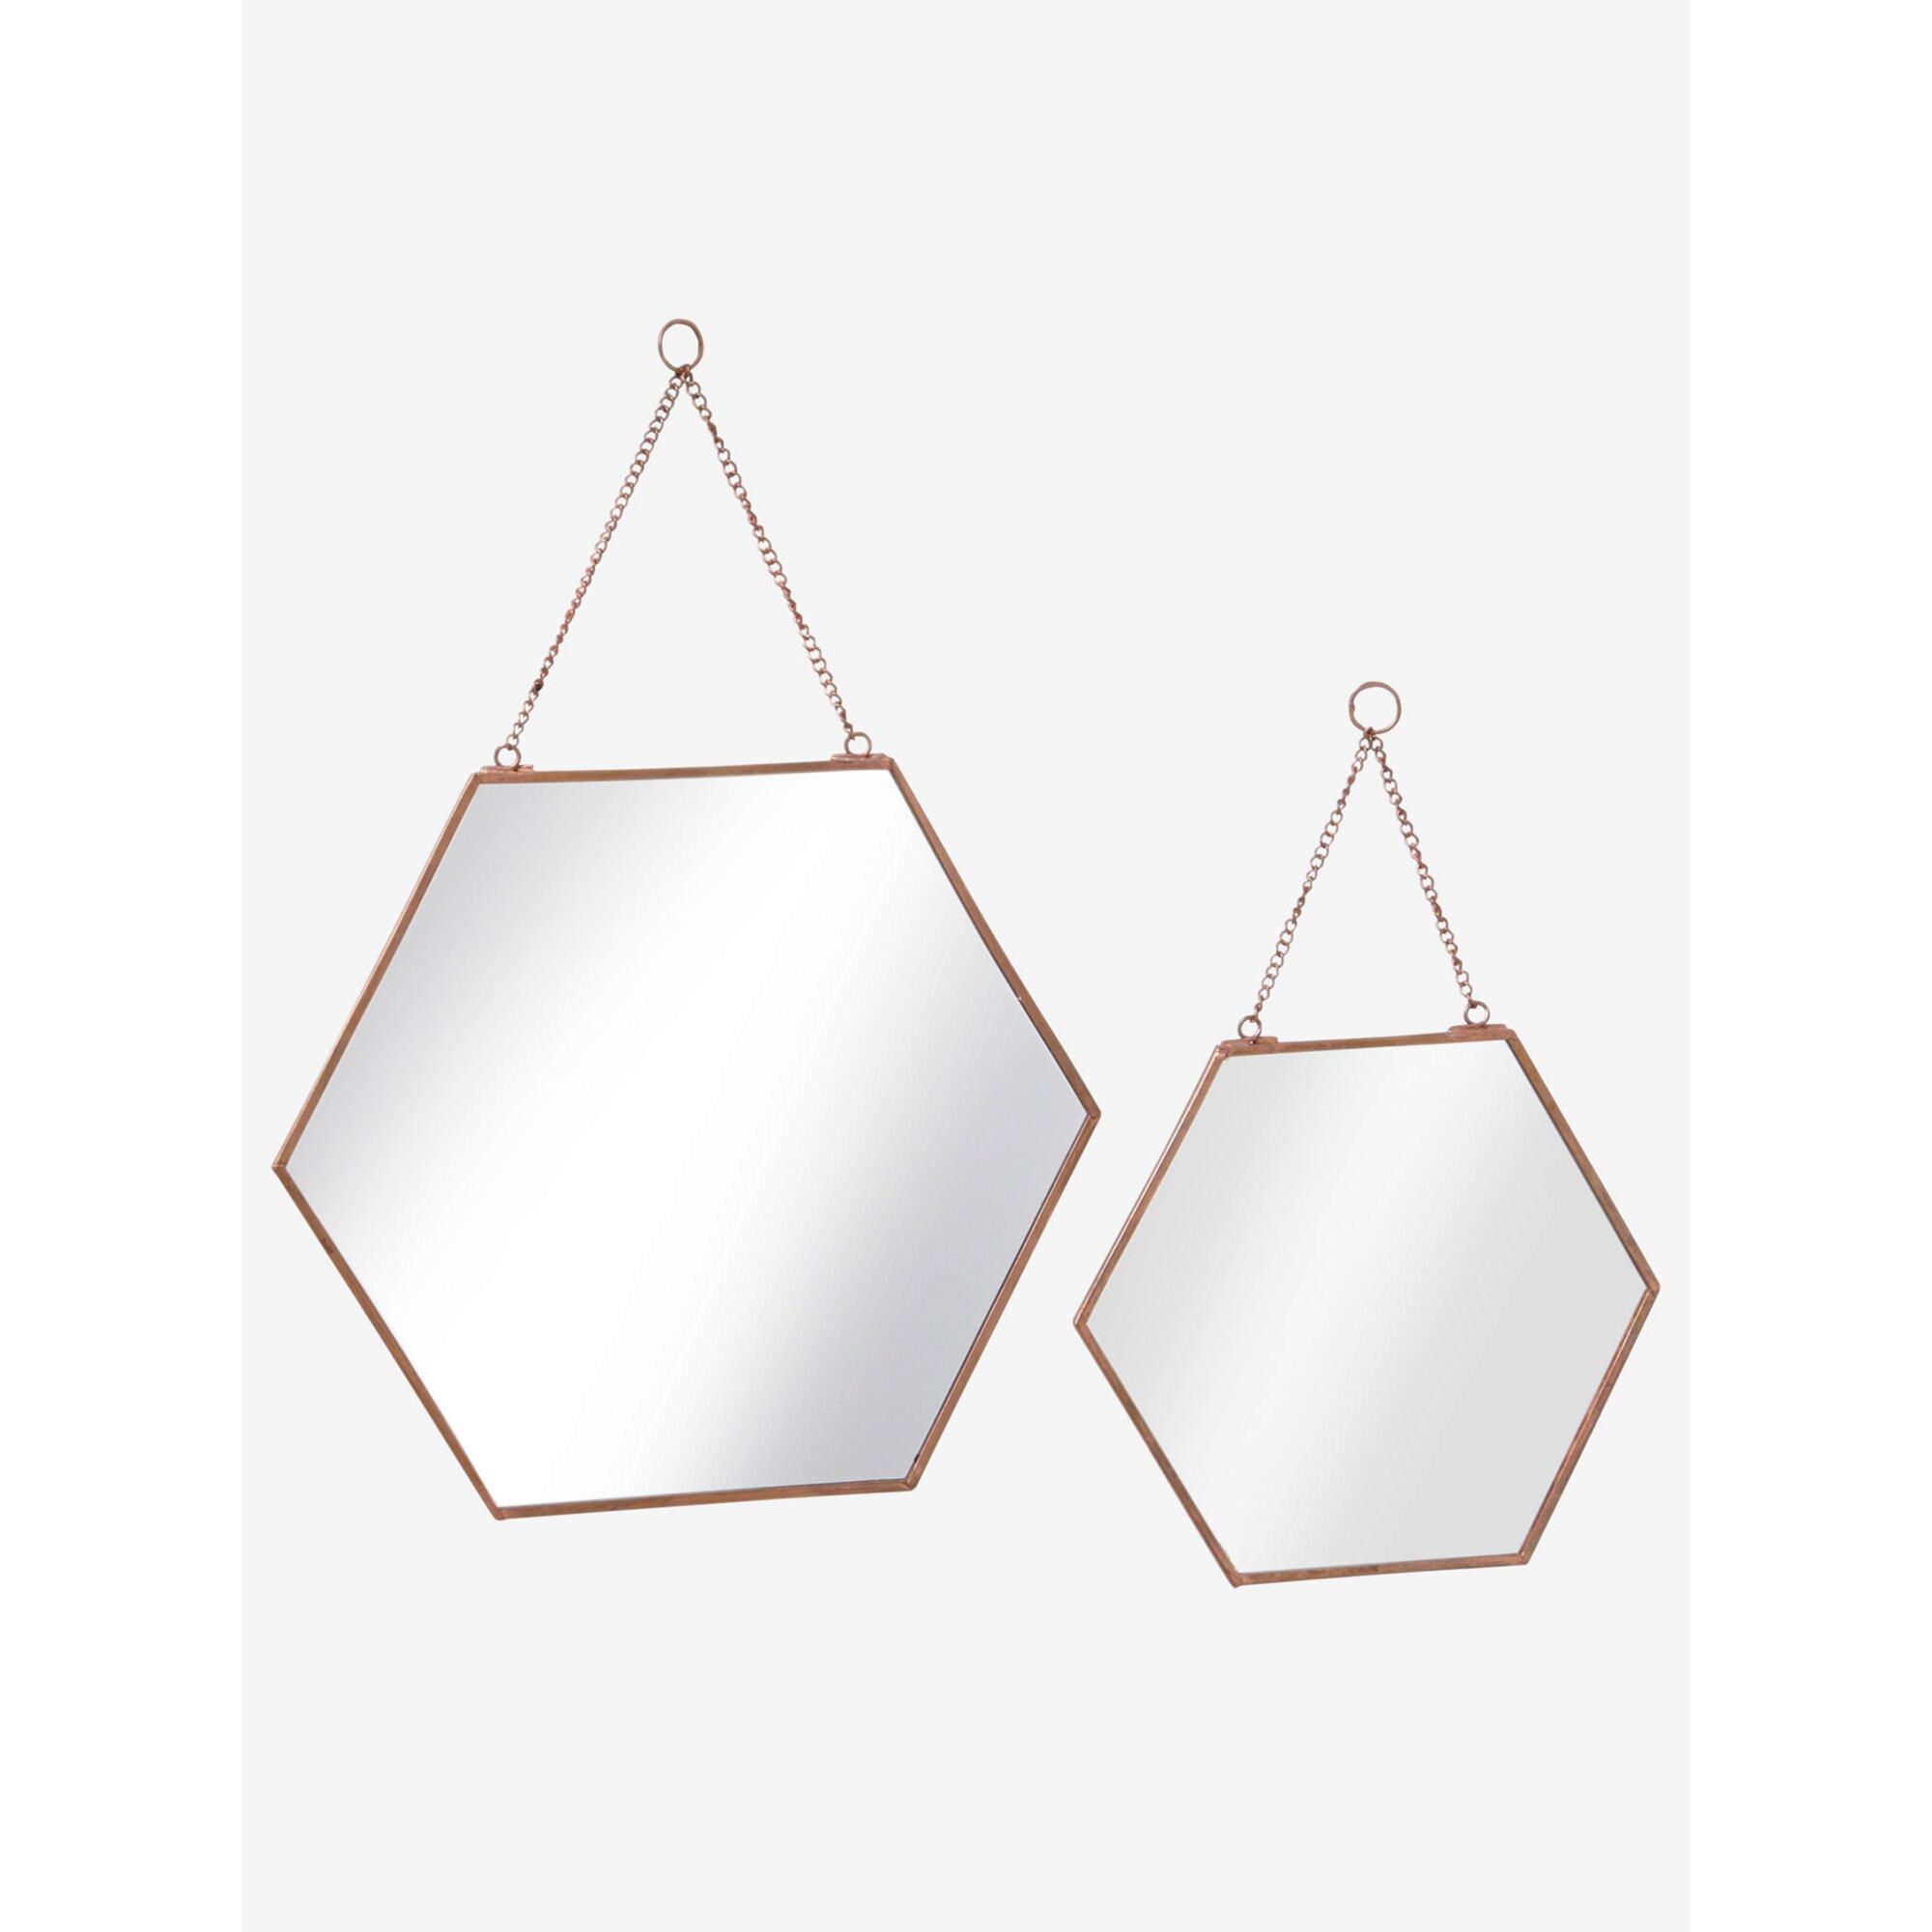 Vertbaudet 2er-Set Spiegel aus Metall